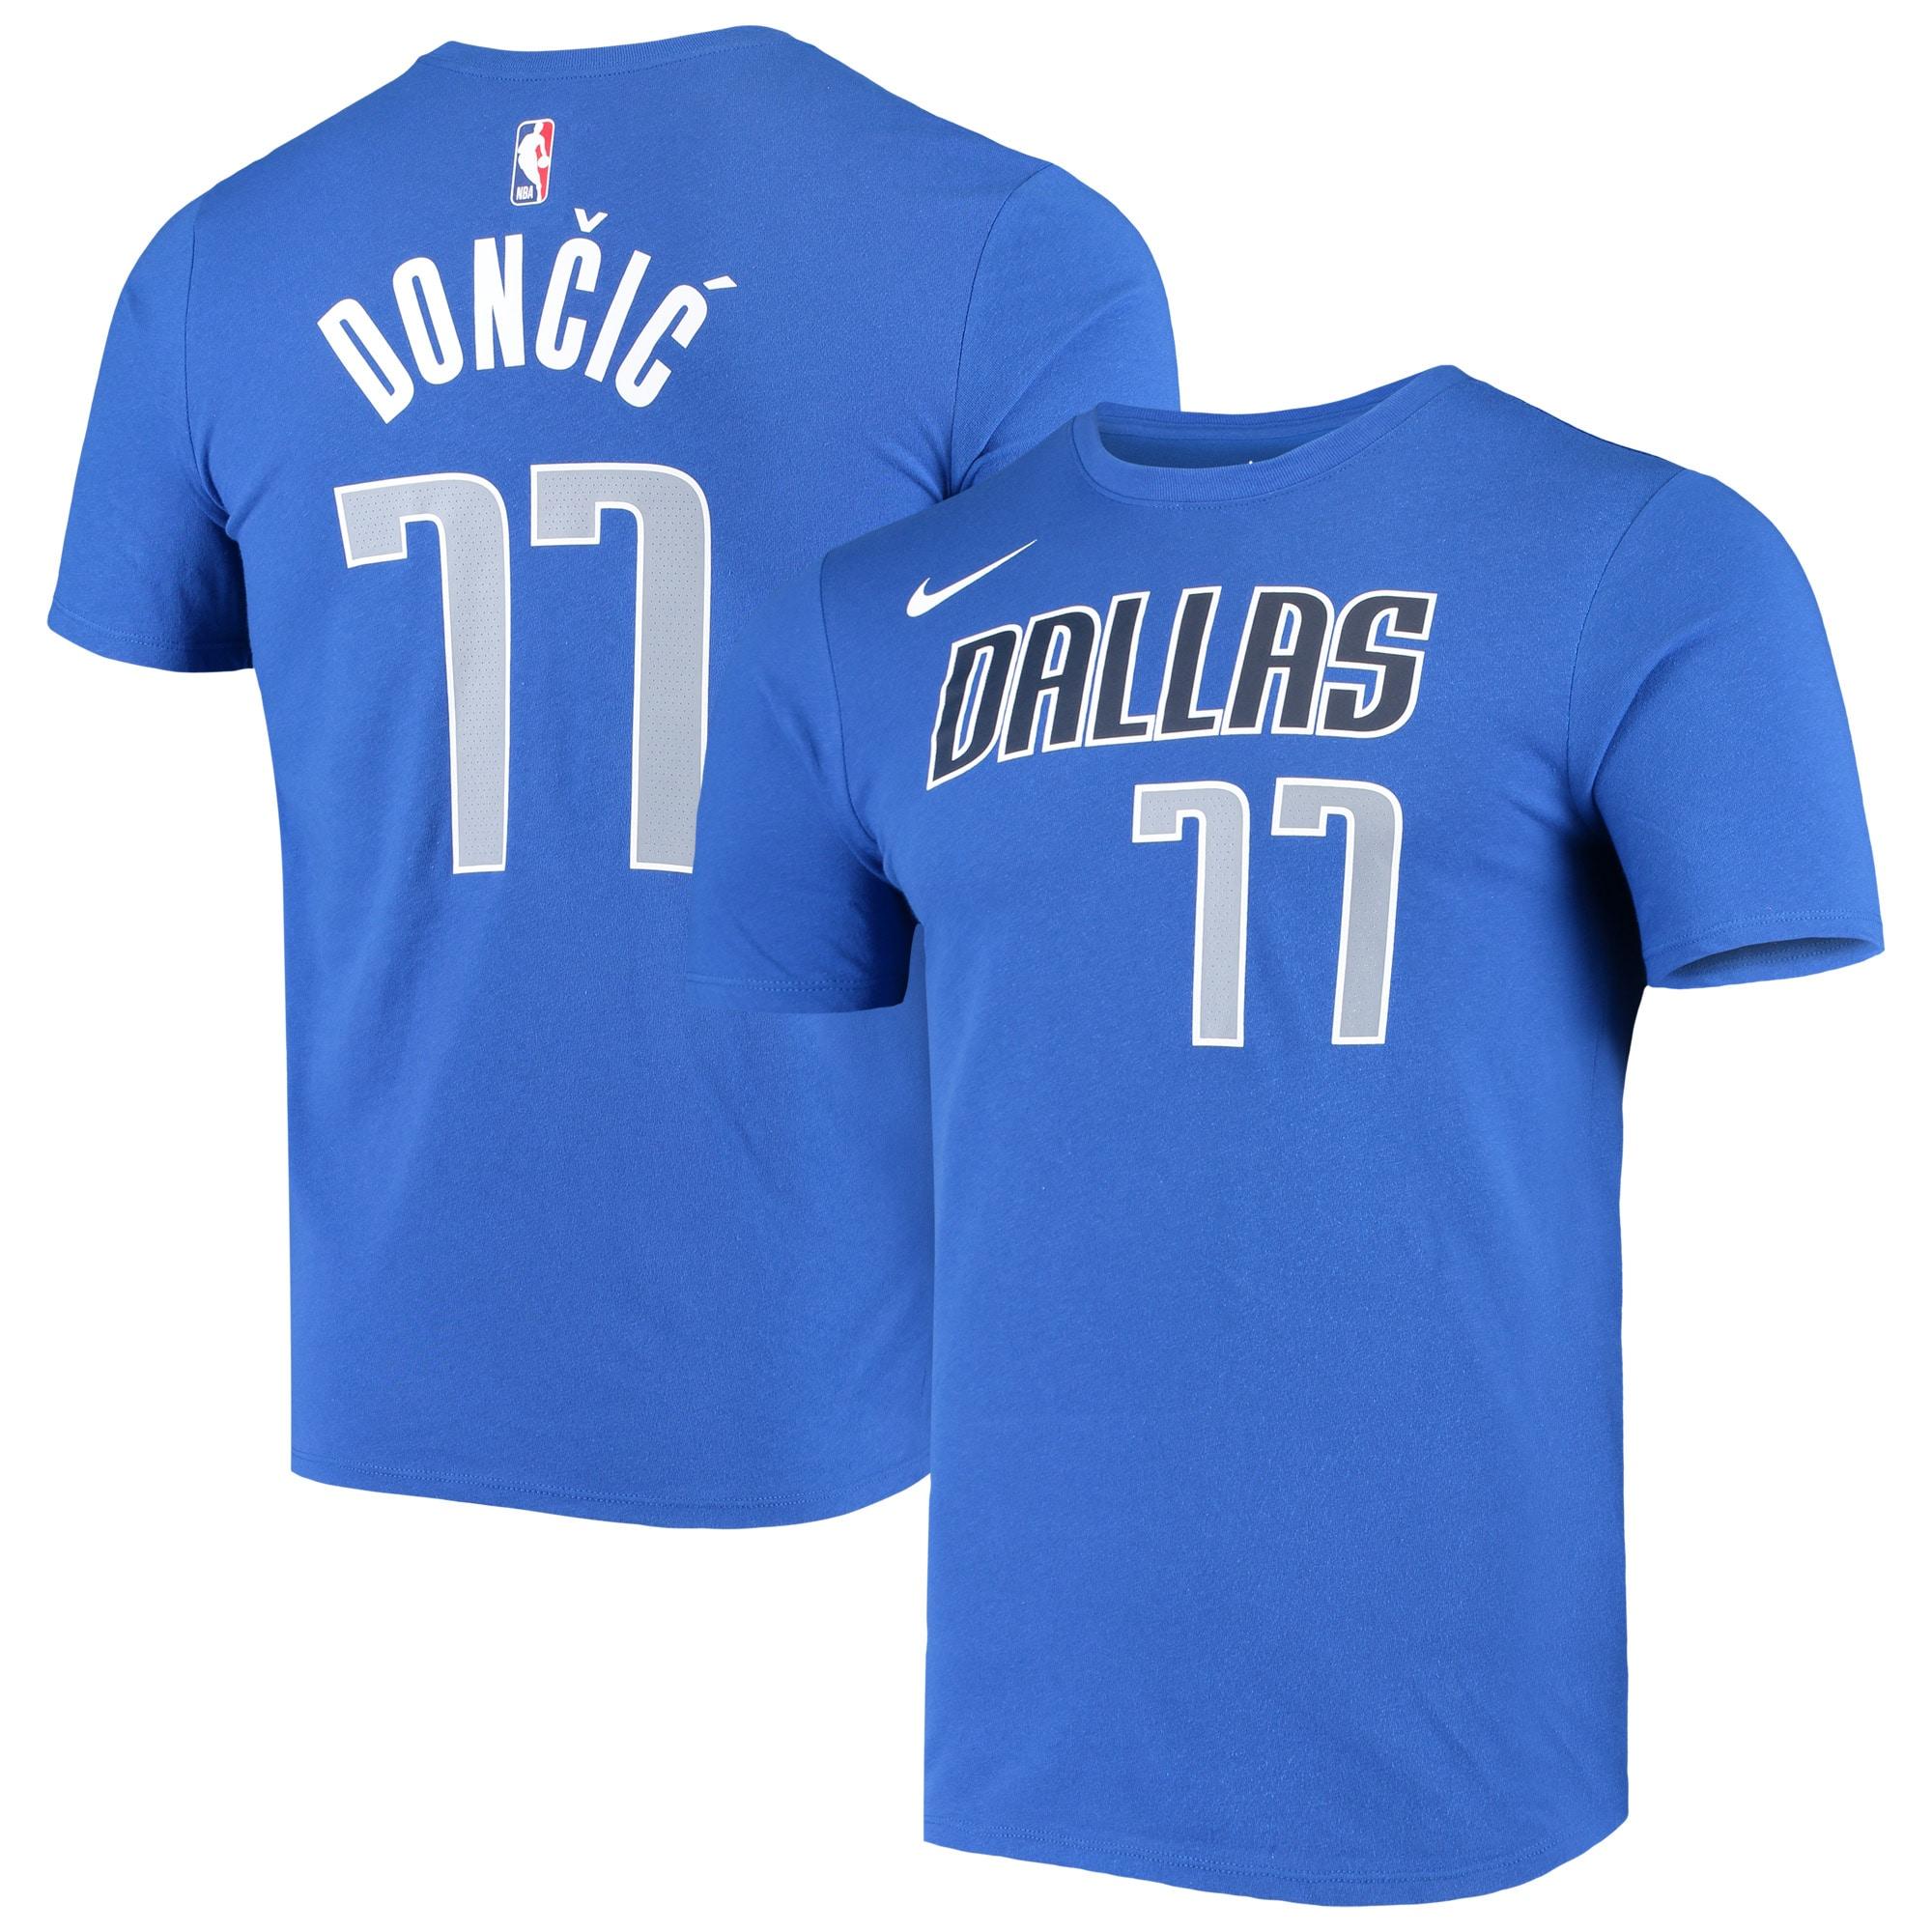 Luka Doncic Dallas Mavericks Nike Statement Edition Name & Number Performance T-Shirt - Blue